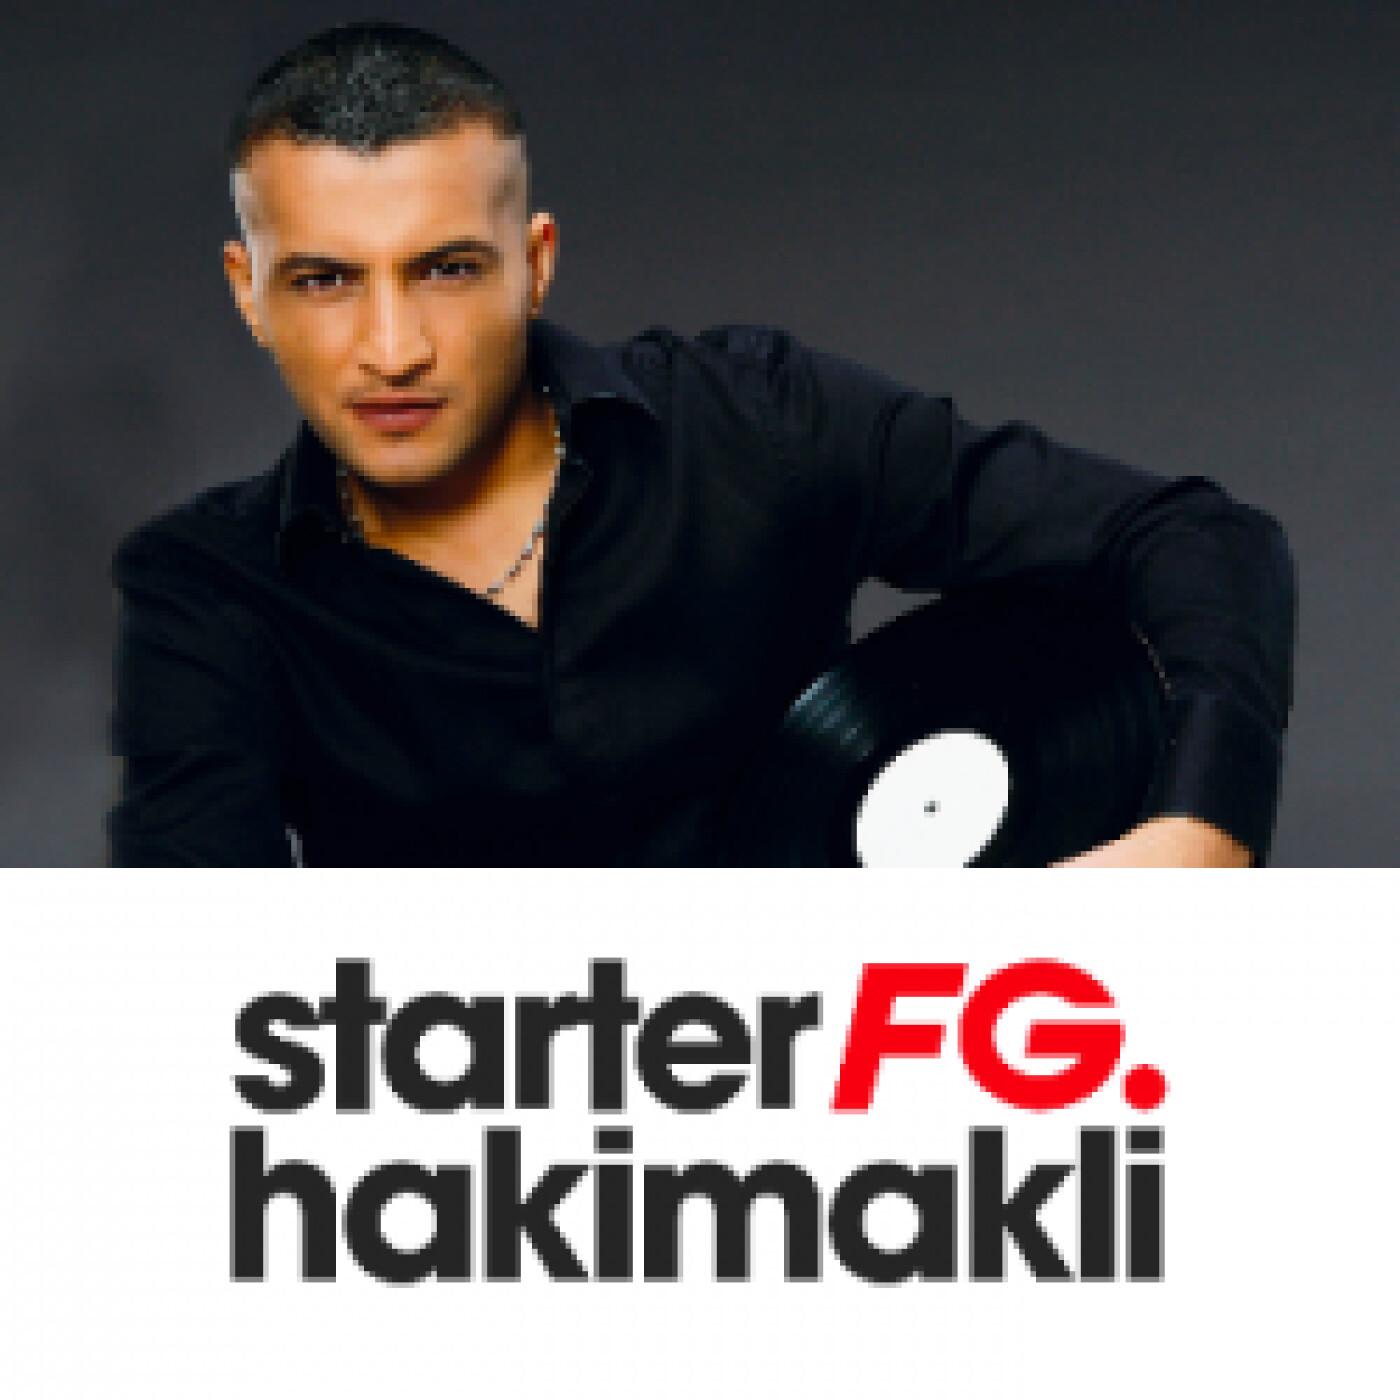 STARTER FG BY HAKIMAKLI MECREDI 31 MARS 2021